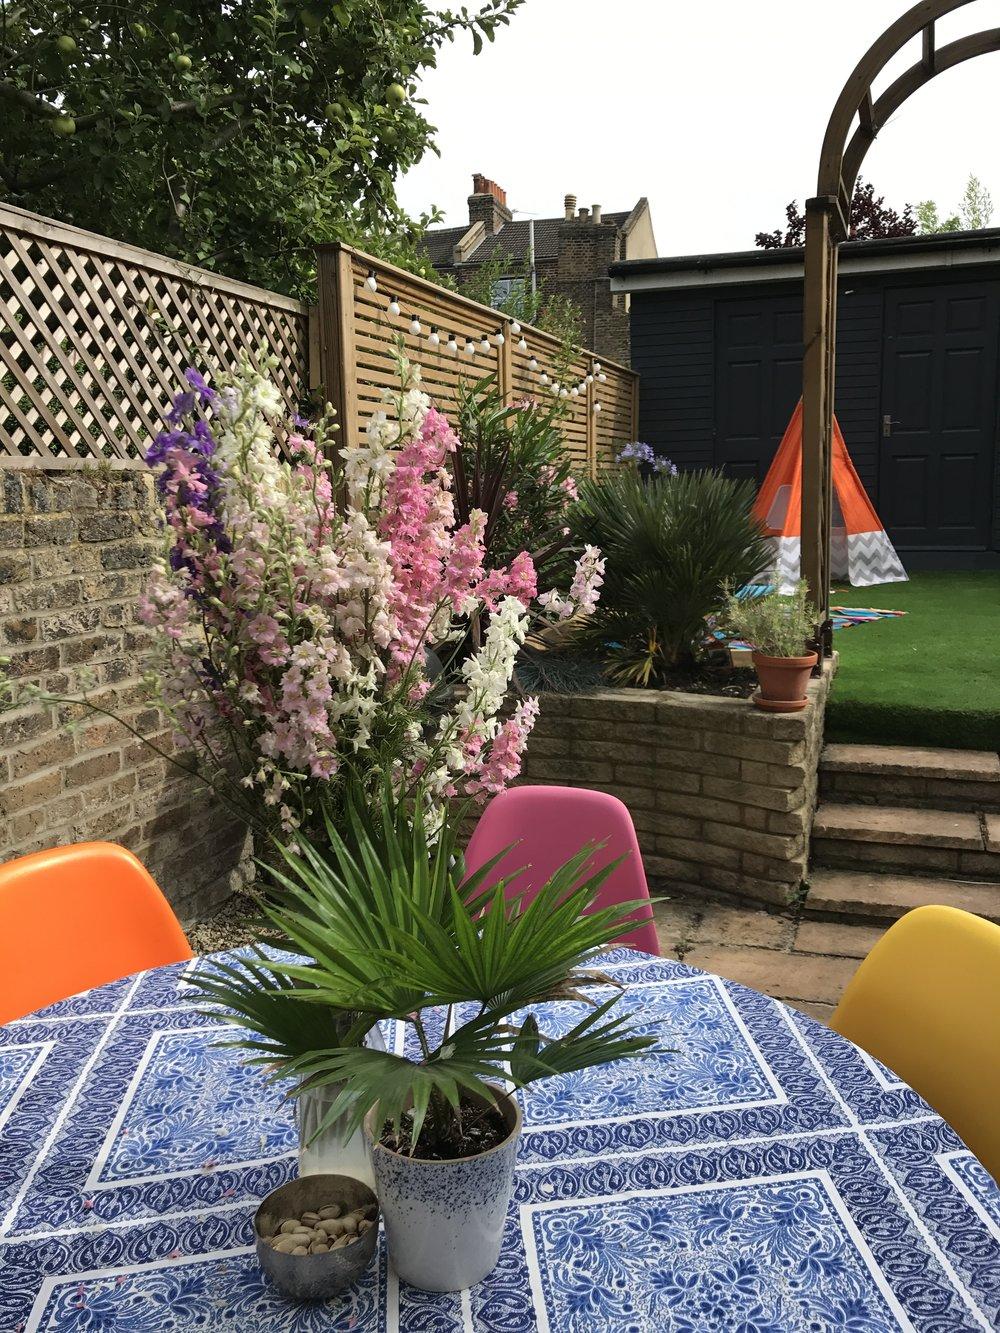 Festoon lighting, plant pot and nibbles bowl -  Sainsbury's Home